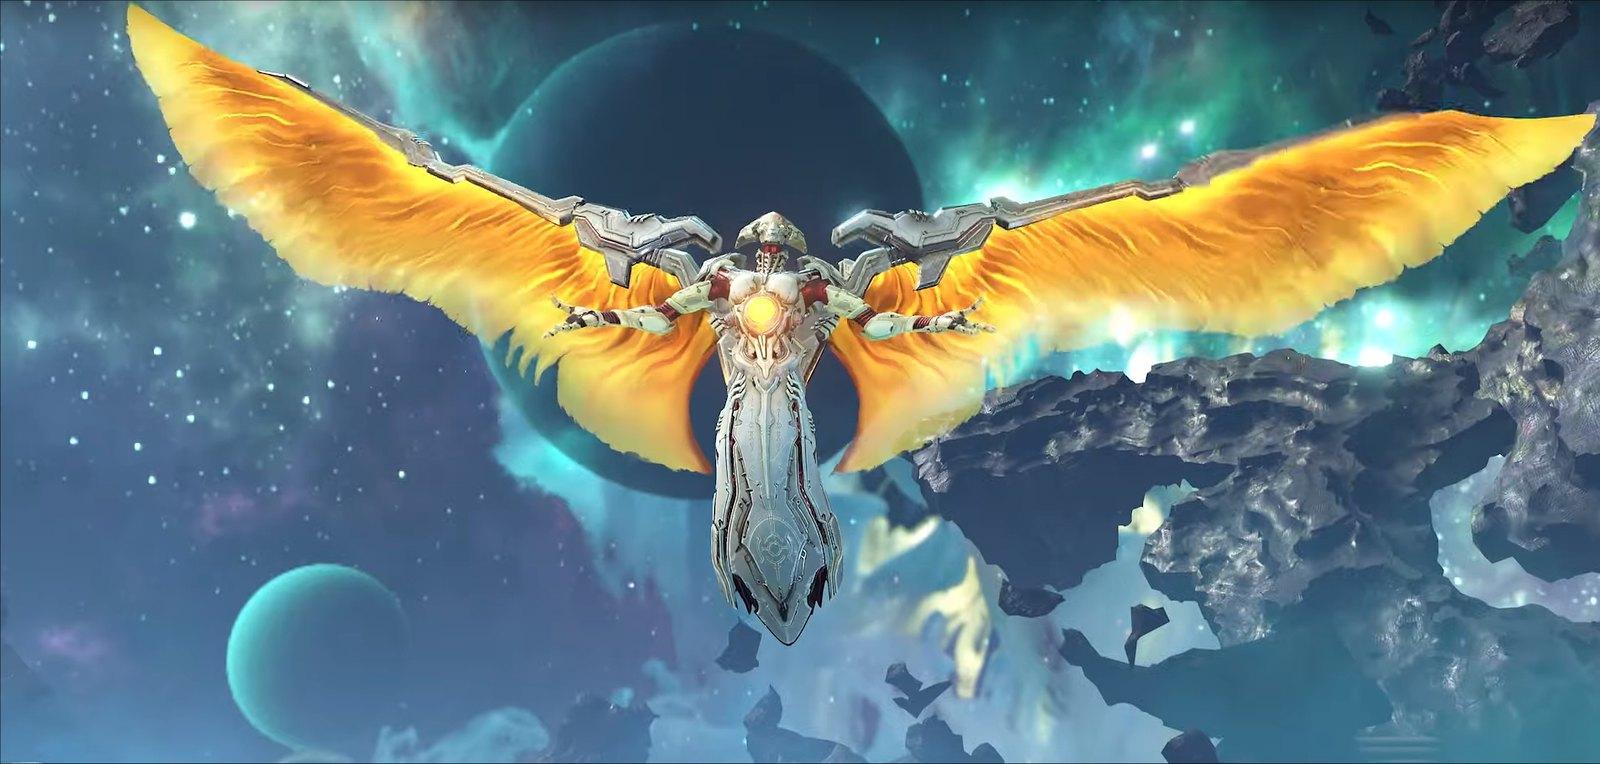 DOOM Eternal - La Ira del Cielo